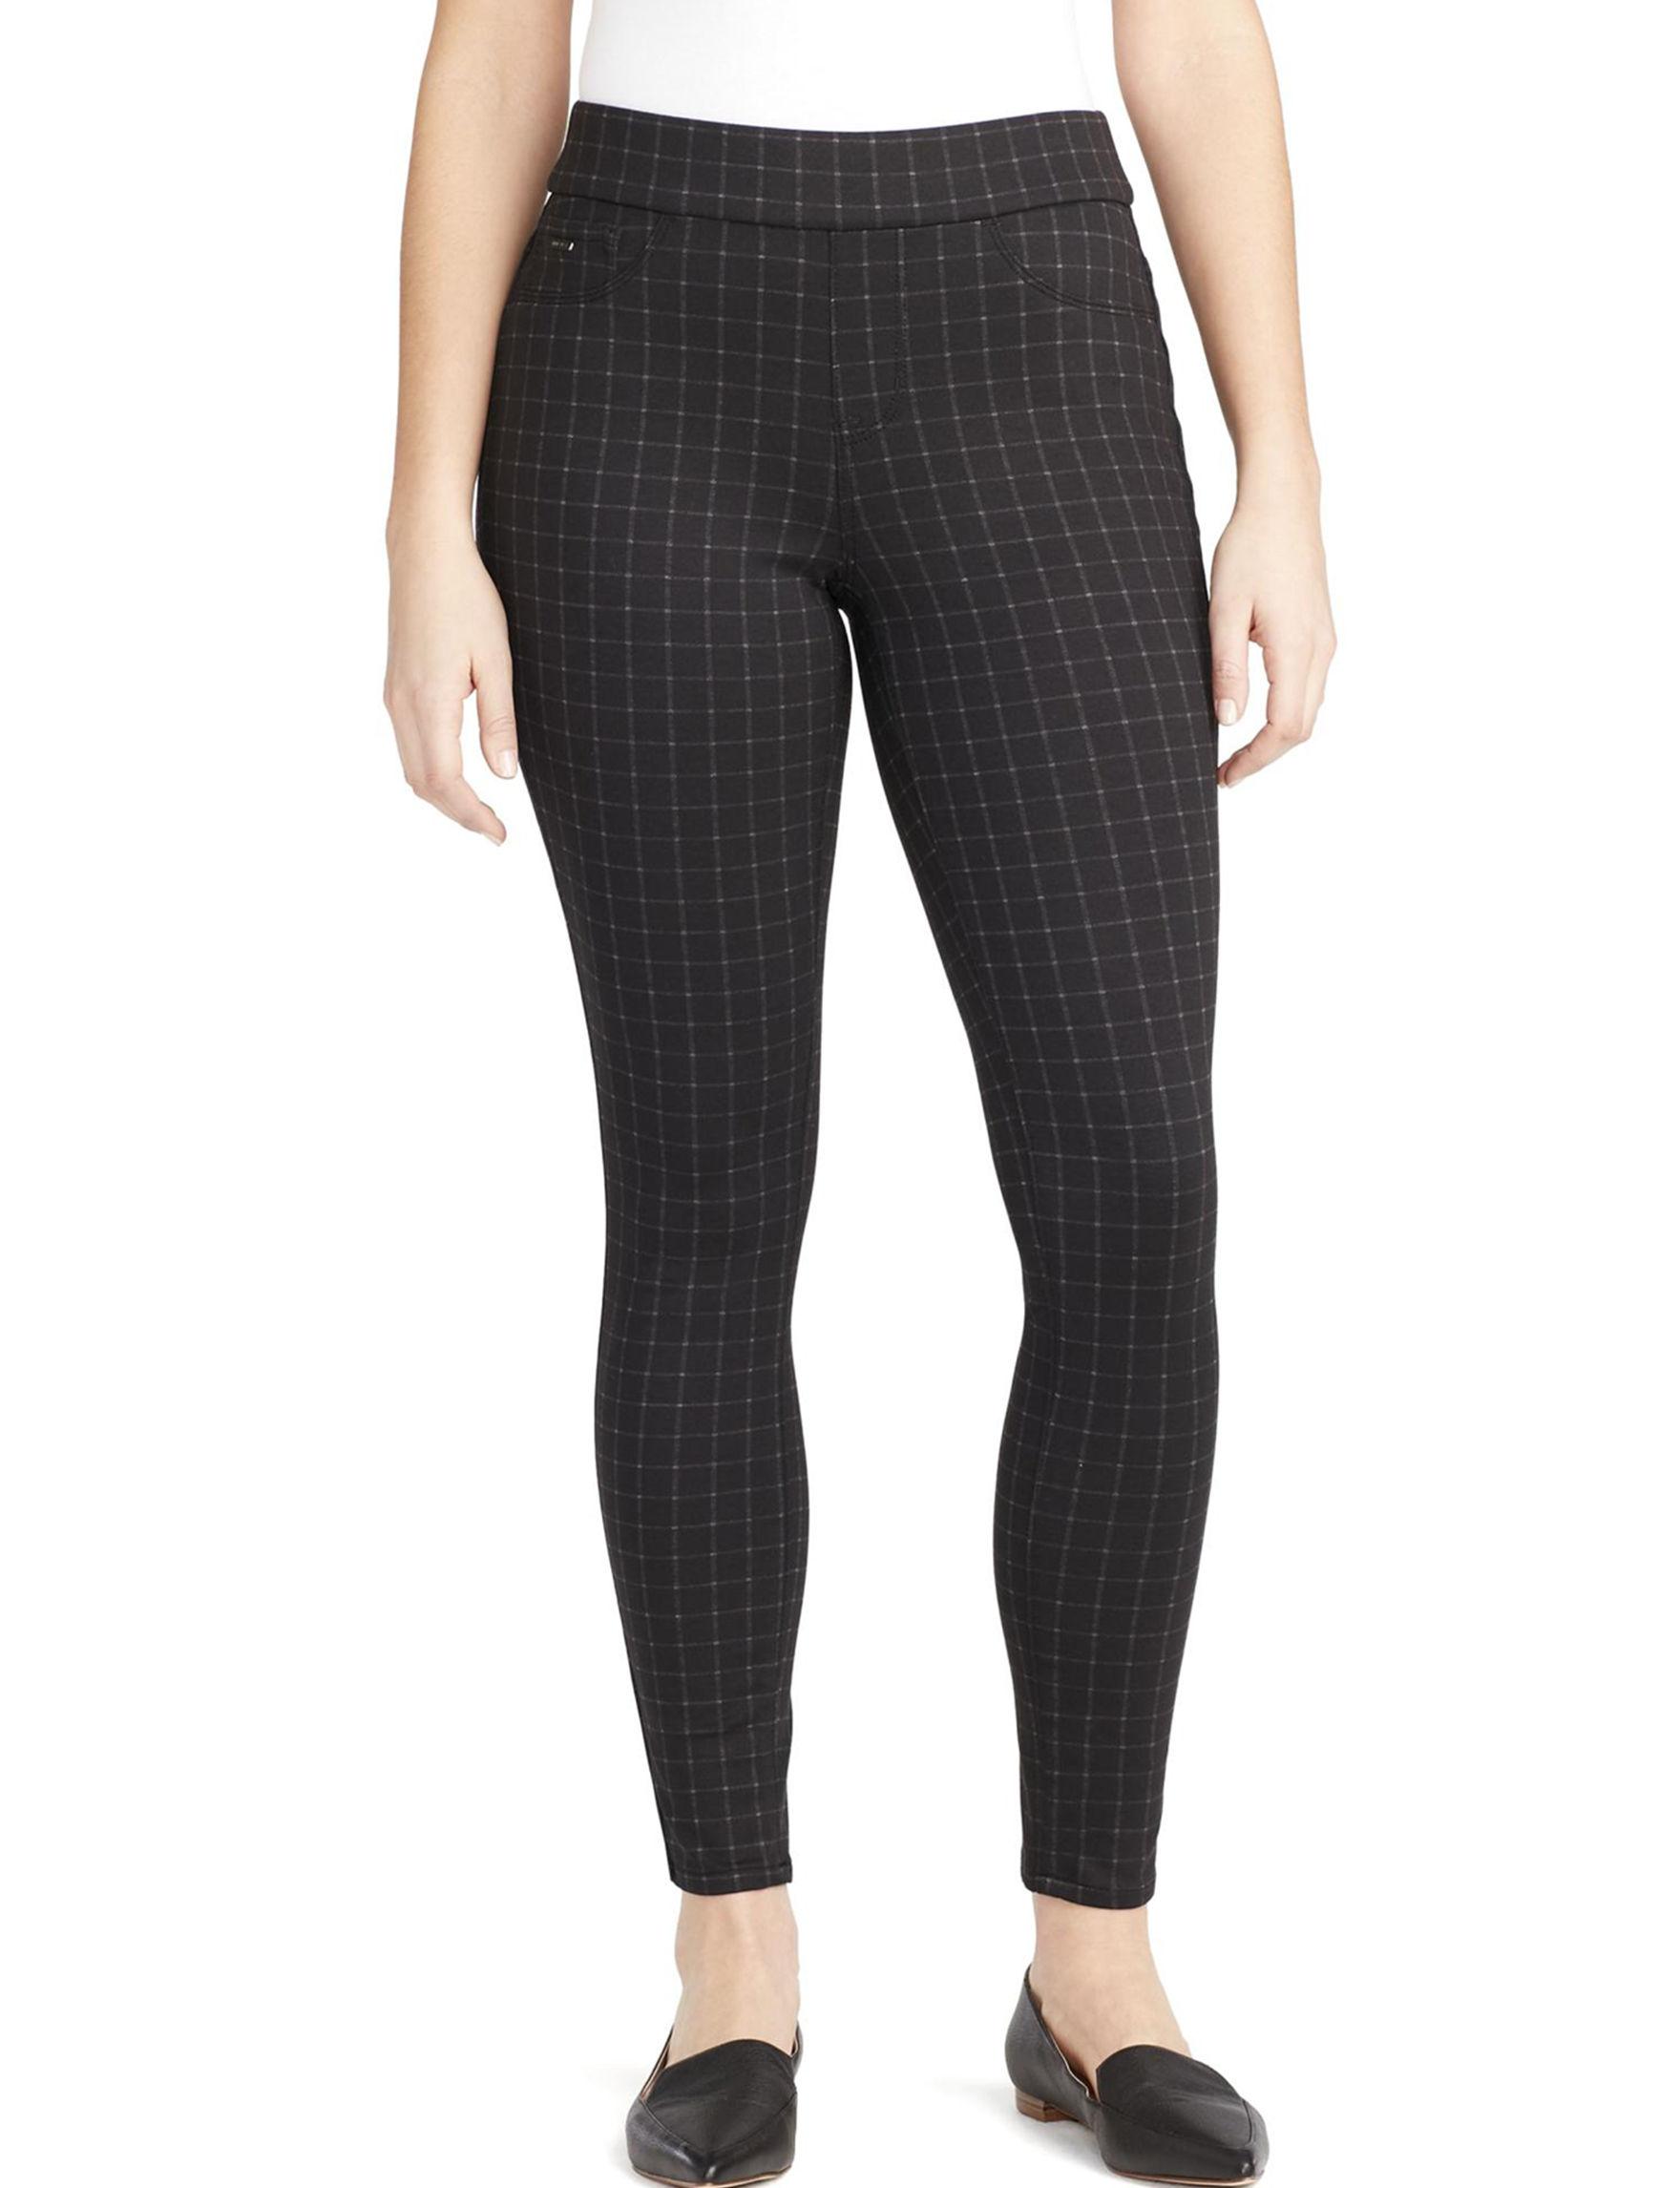 Nine West Black Plaid Soft Pants